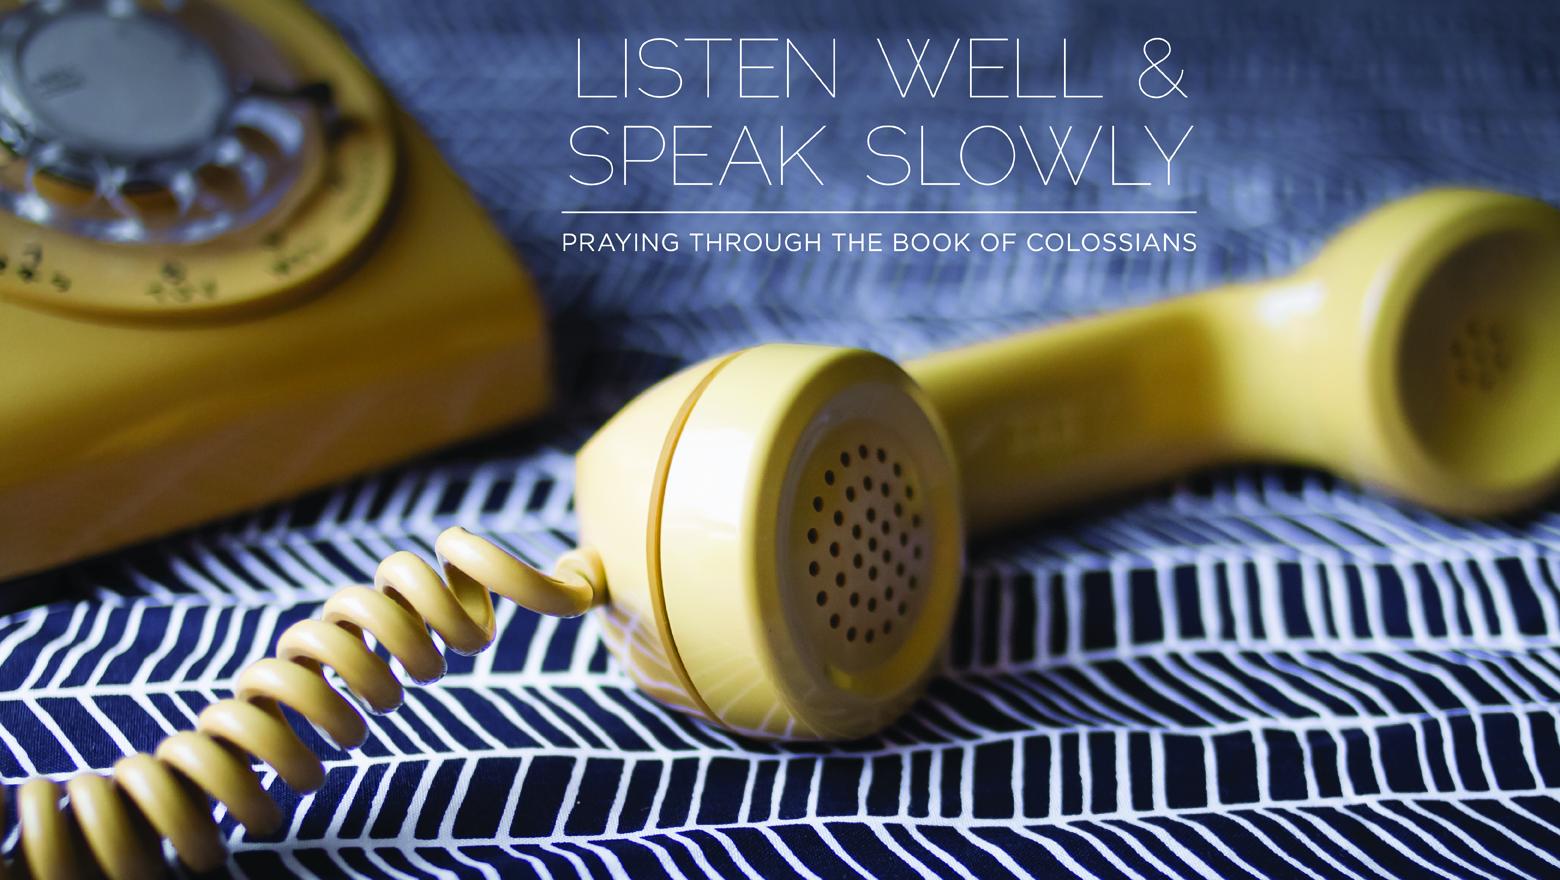 Listen Well and Speak Slowly